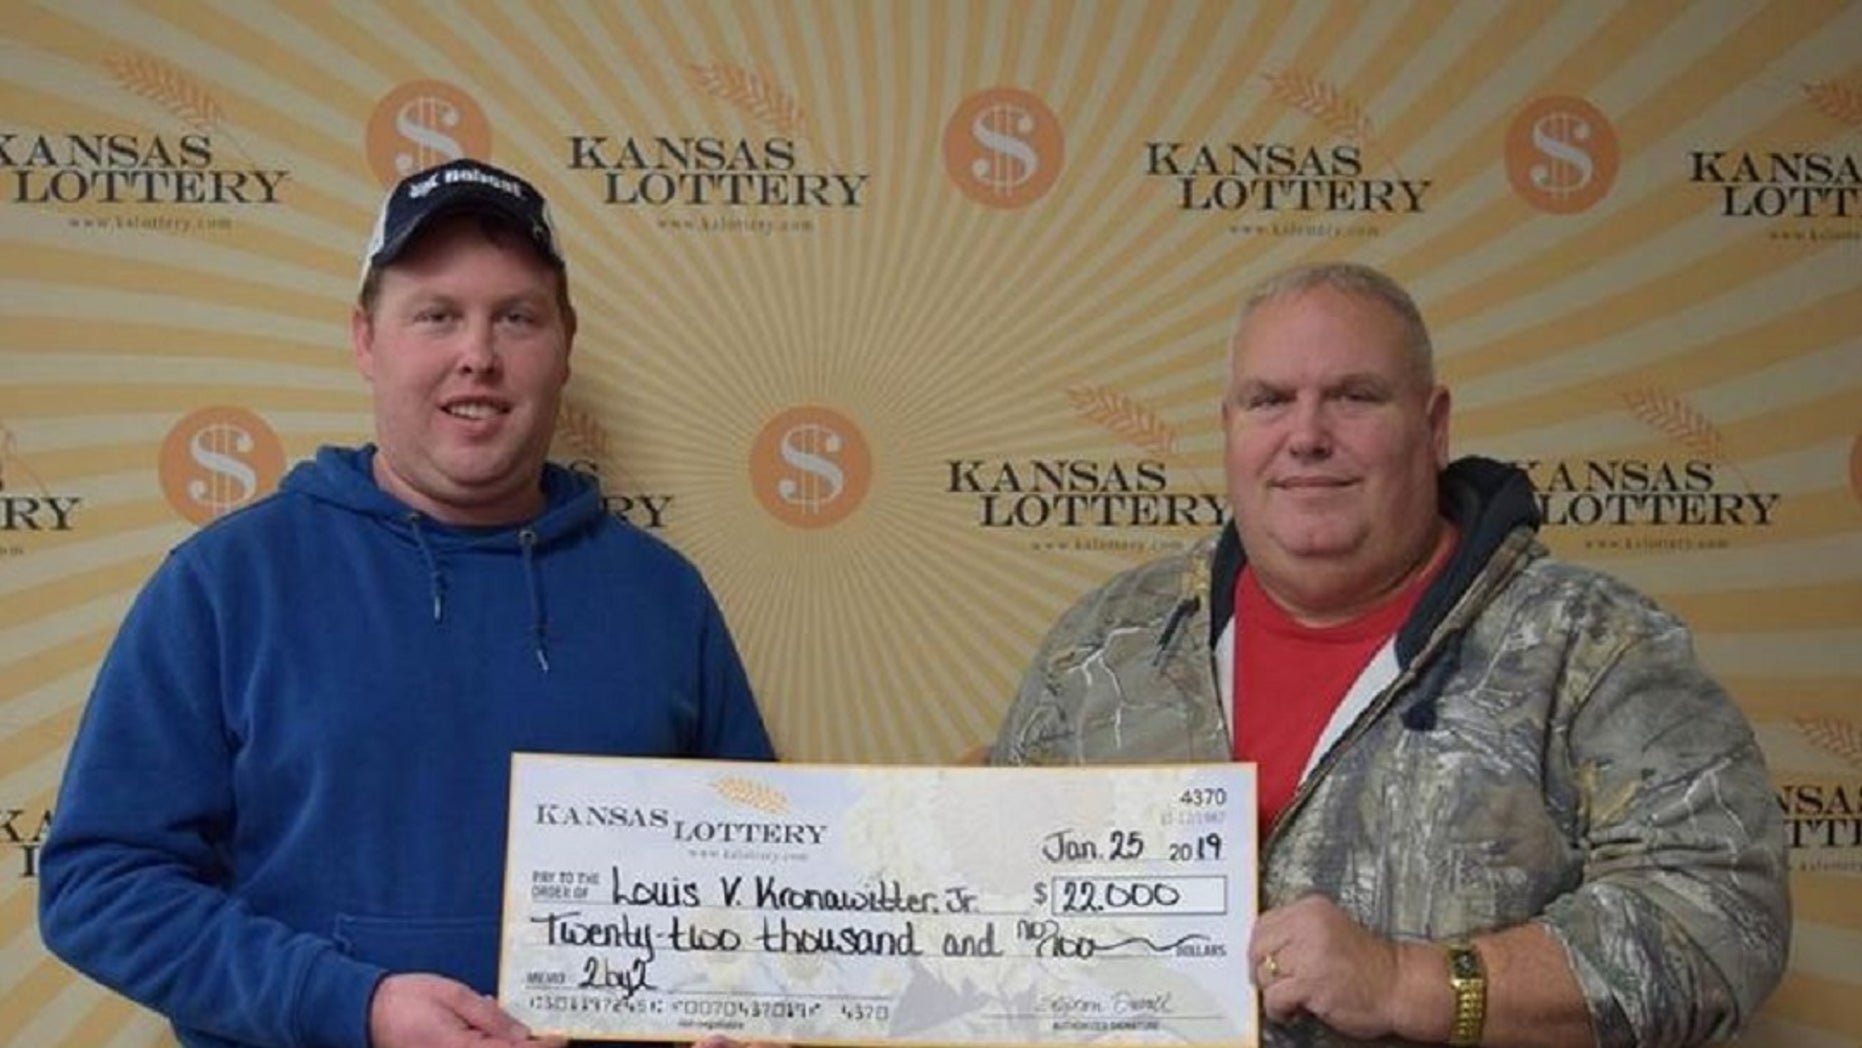 Kansas Lottery winner Louis V. Kronawitter Jr., right, and his son Austin Kronawitter pose with a $22,000 check. (Kansas Lottery)